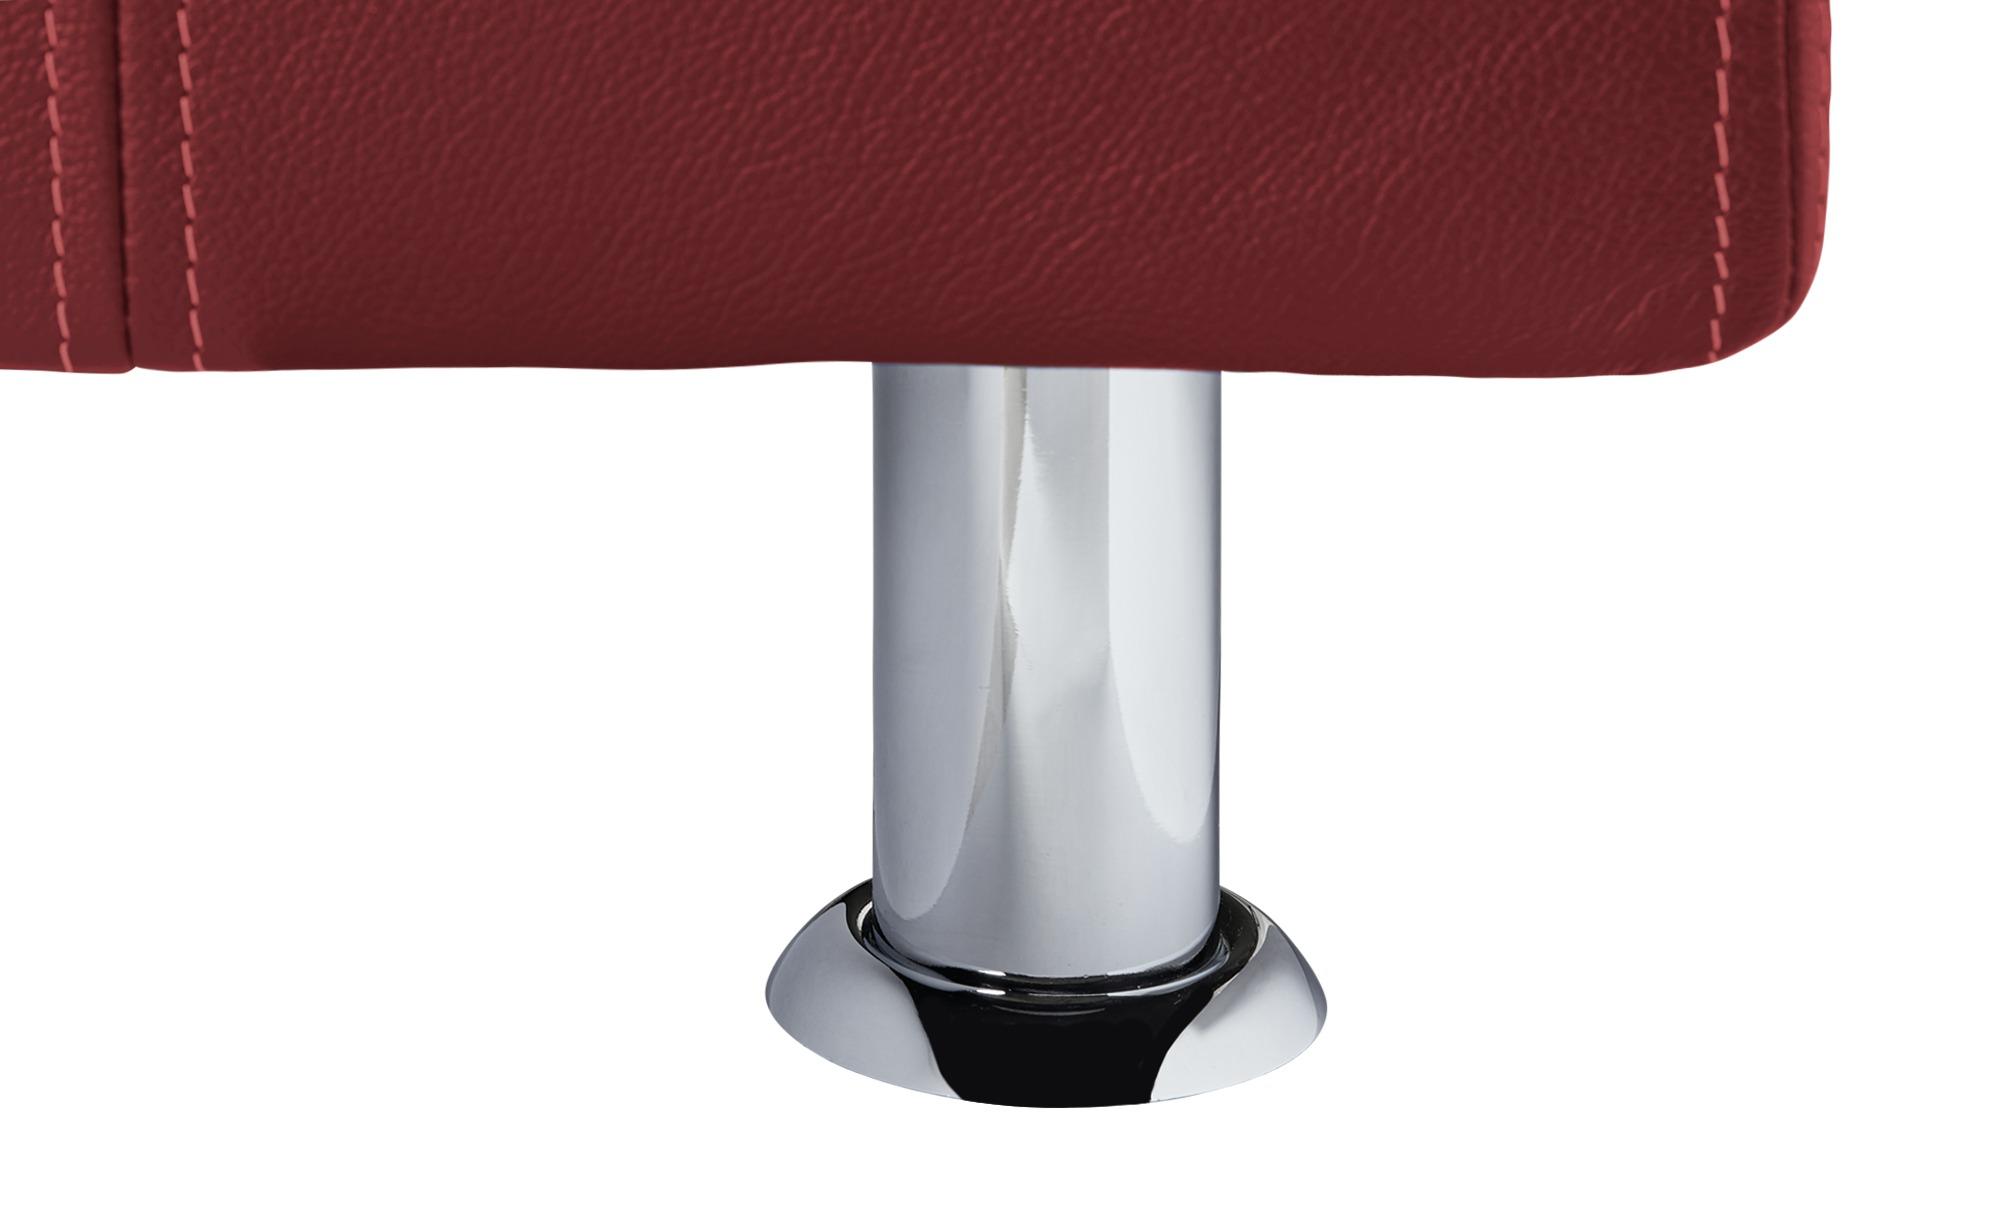 Boxspringbett 160x200 - rot - Leder Bella II | Weinrot, 160 cm